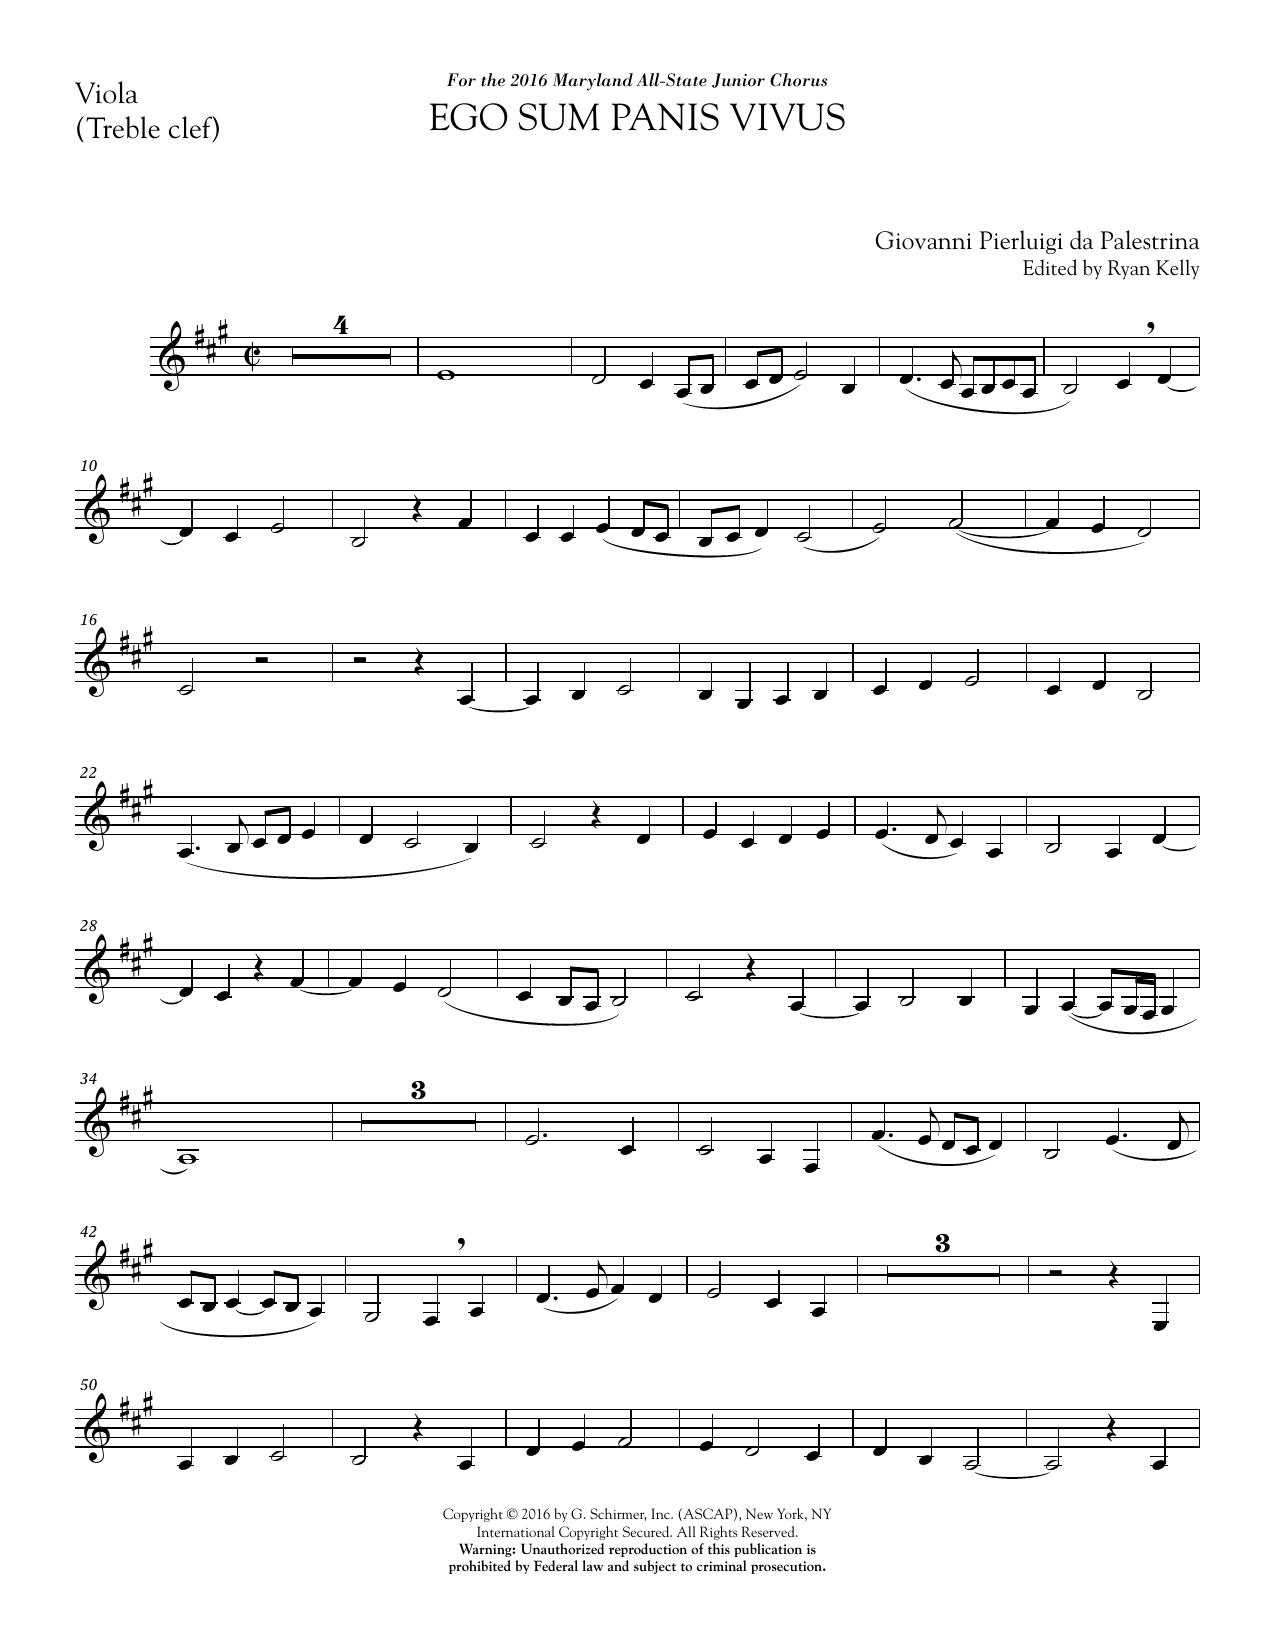 Ego sum panis vivus (ed. Ryan Kelly) - 1st Viola Sheet Music